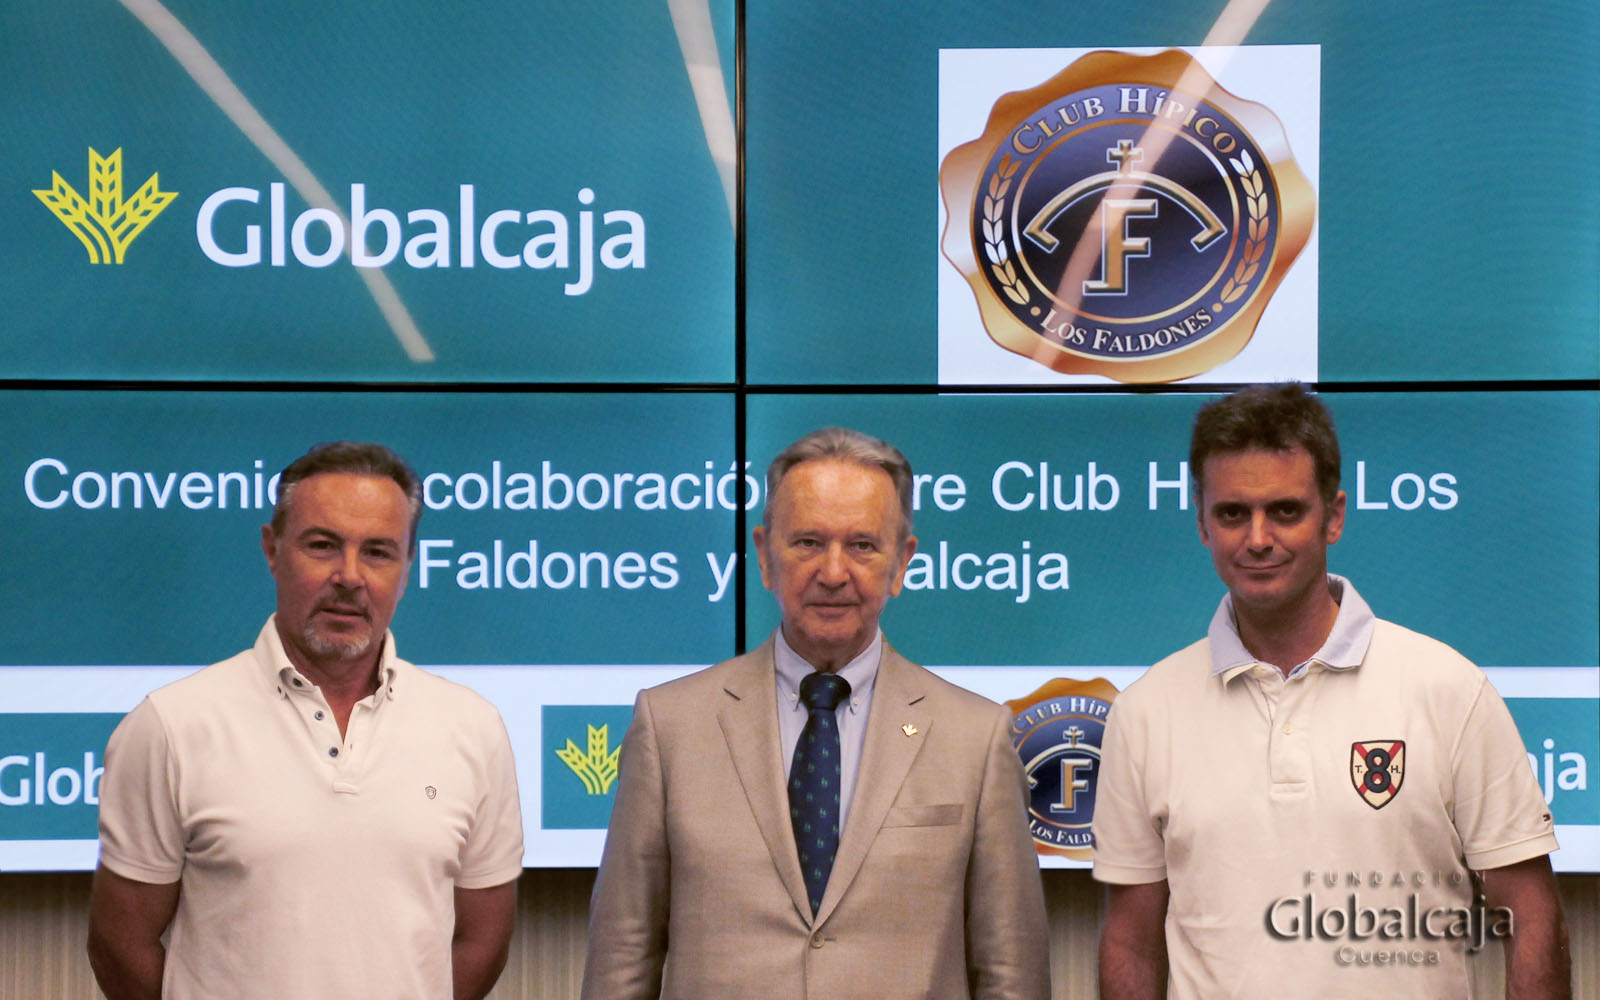 https://blog.globalcaja.es/wp-content/uploads/2017/09/globalcaja-concurso-hipica-Cuenca.jpg